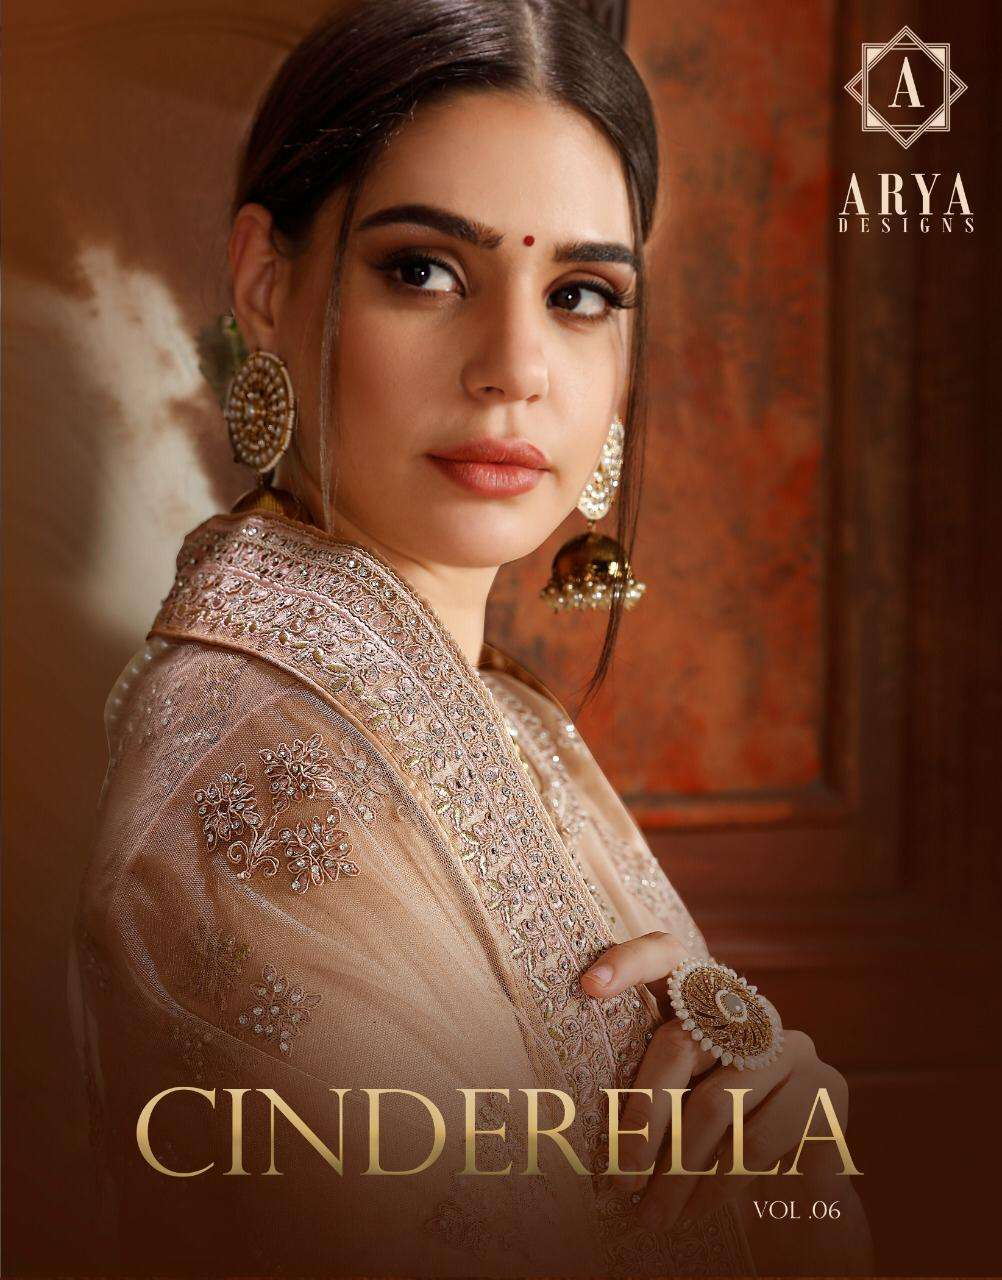 Arya designs Cinderella Vol 6 3301 to 3326 Series Lehenga Choli New Designs